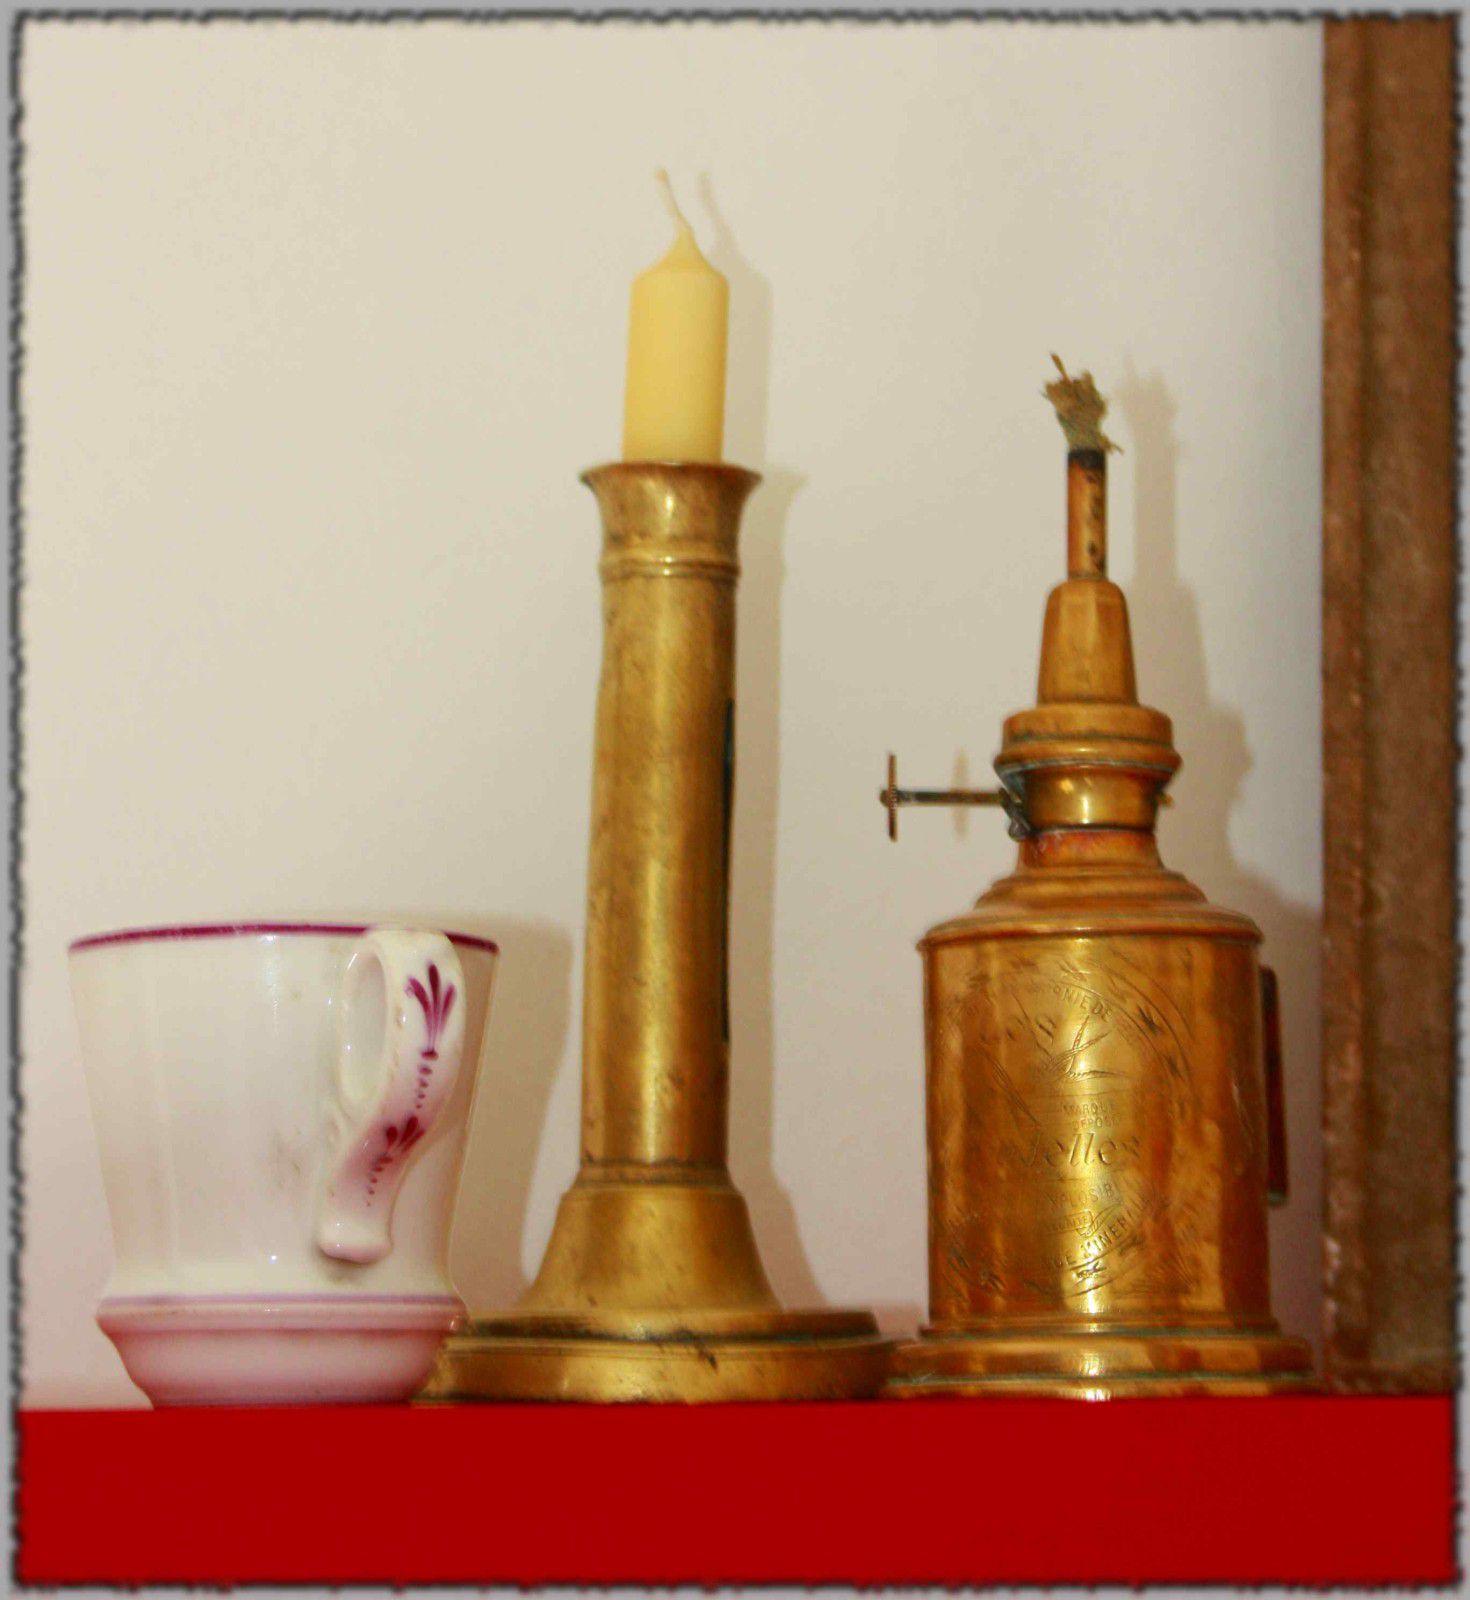 et patati et petites croix patati et petites croix de. Black Bedroom Furniture Sets. Home Design Ideas